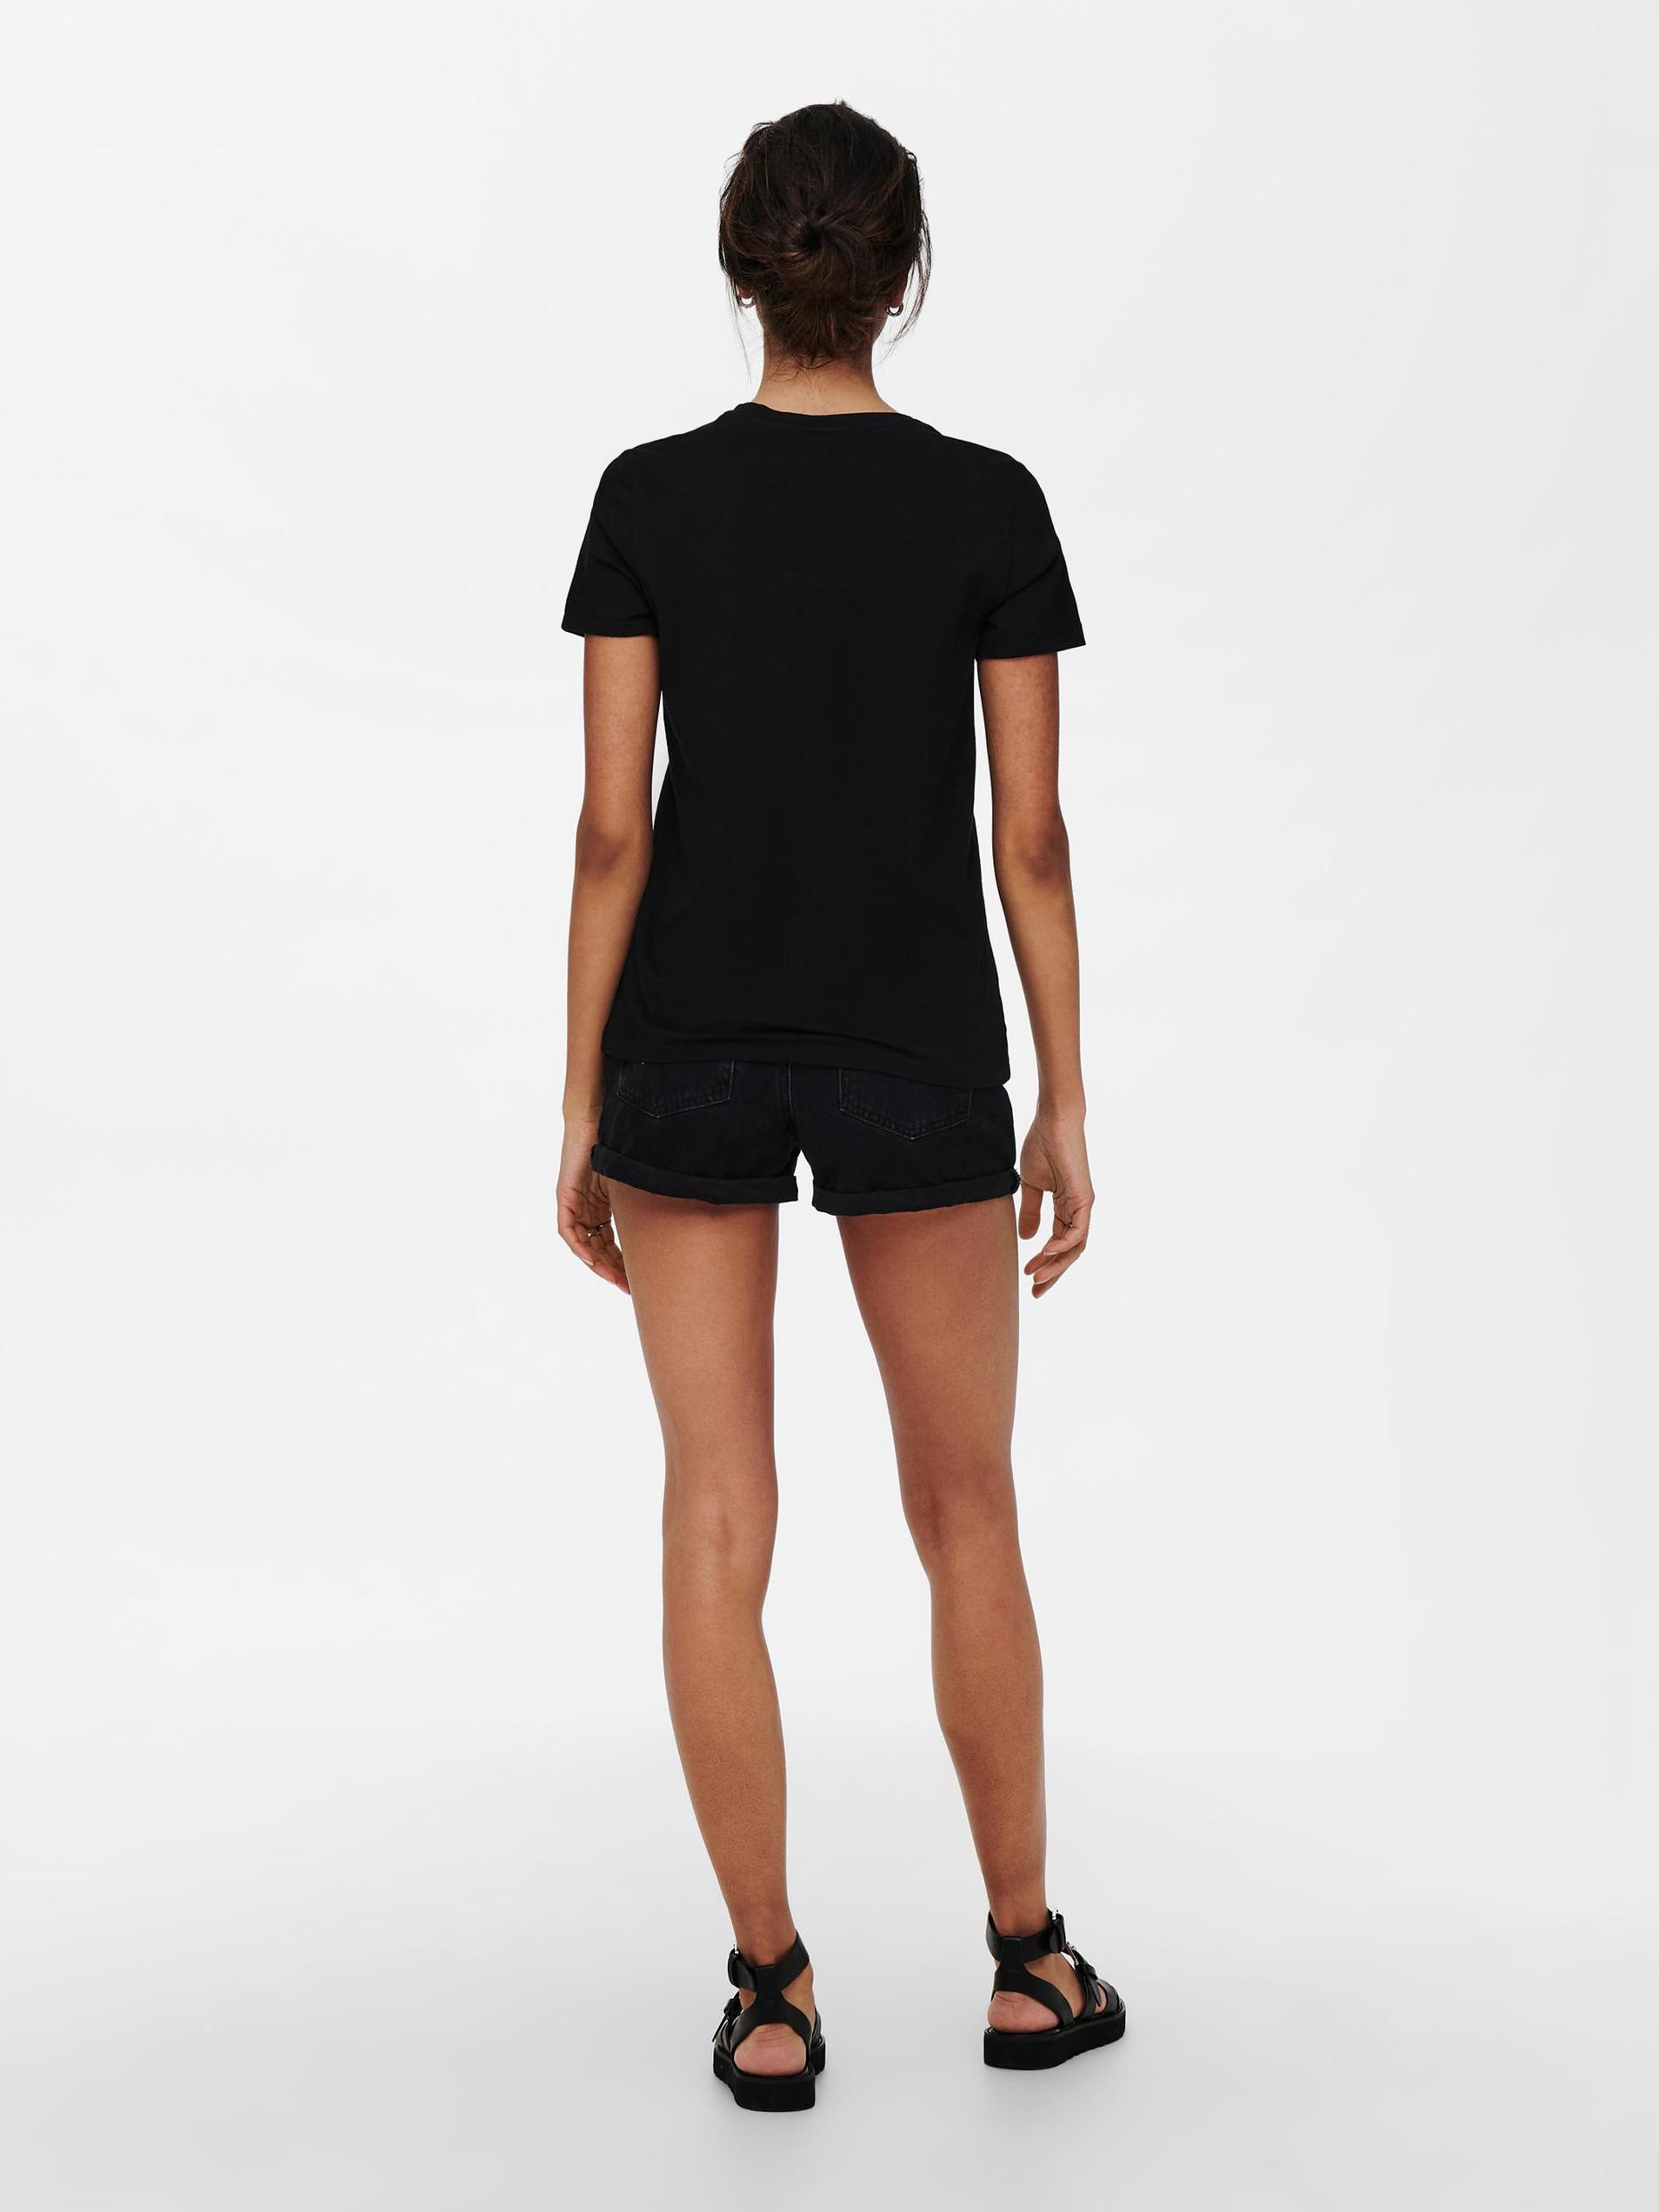 Only nero da donna maglietta Lana